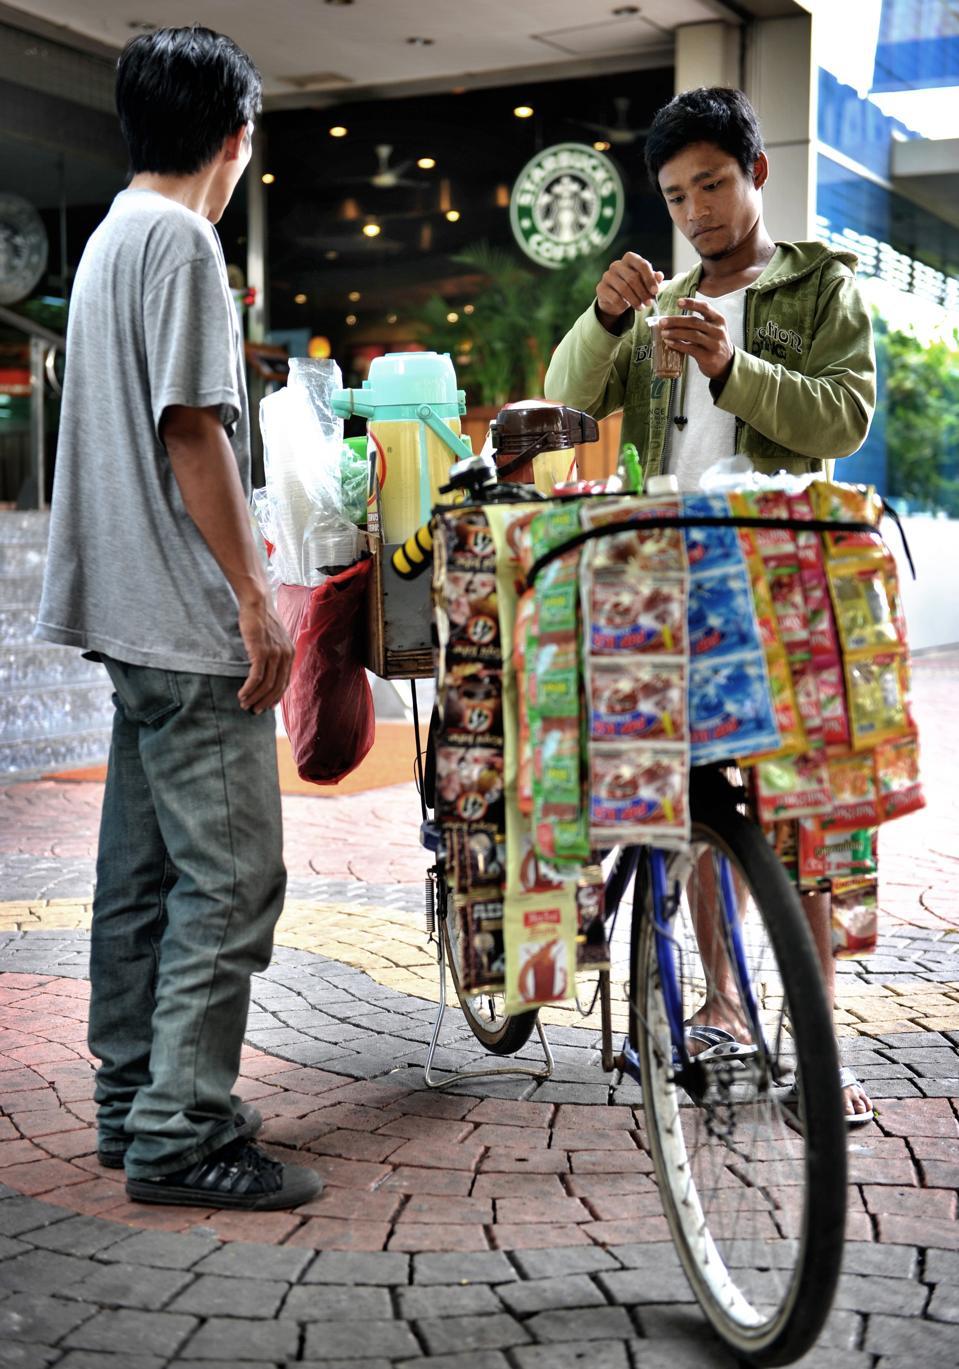 Bicycle coffee vendors